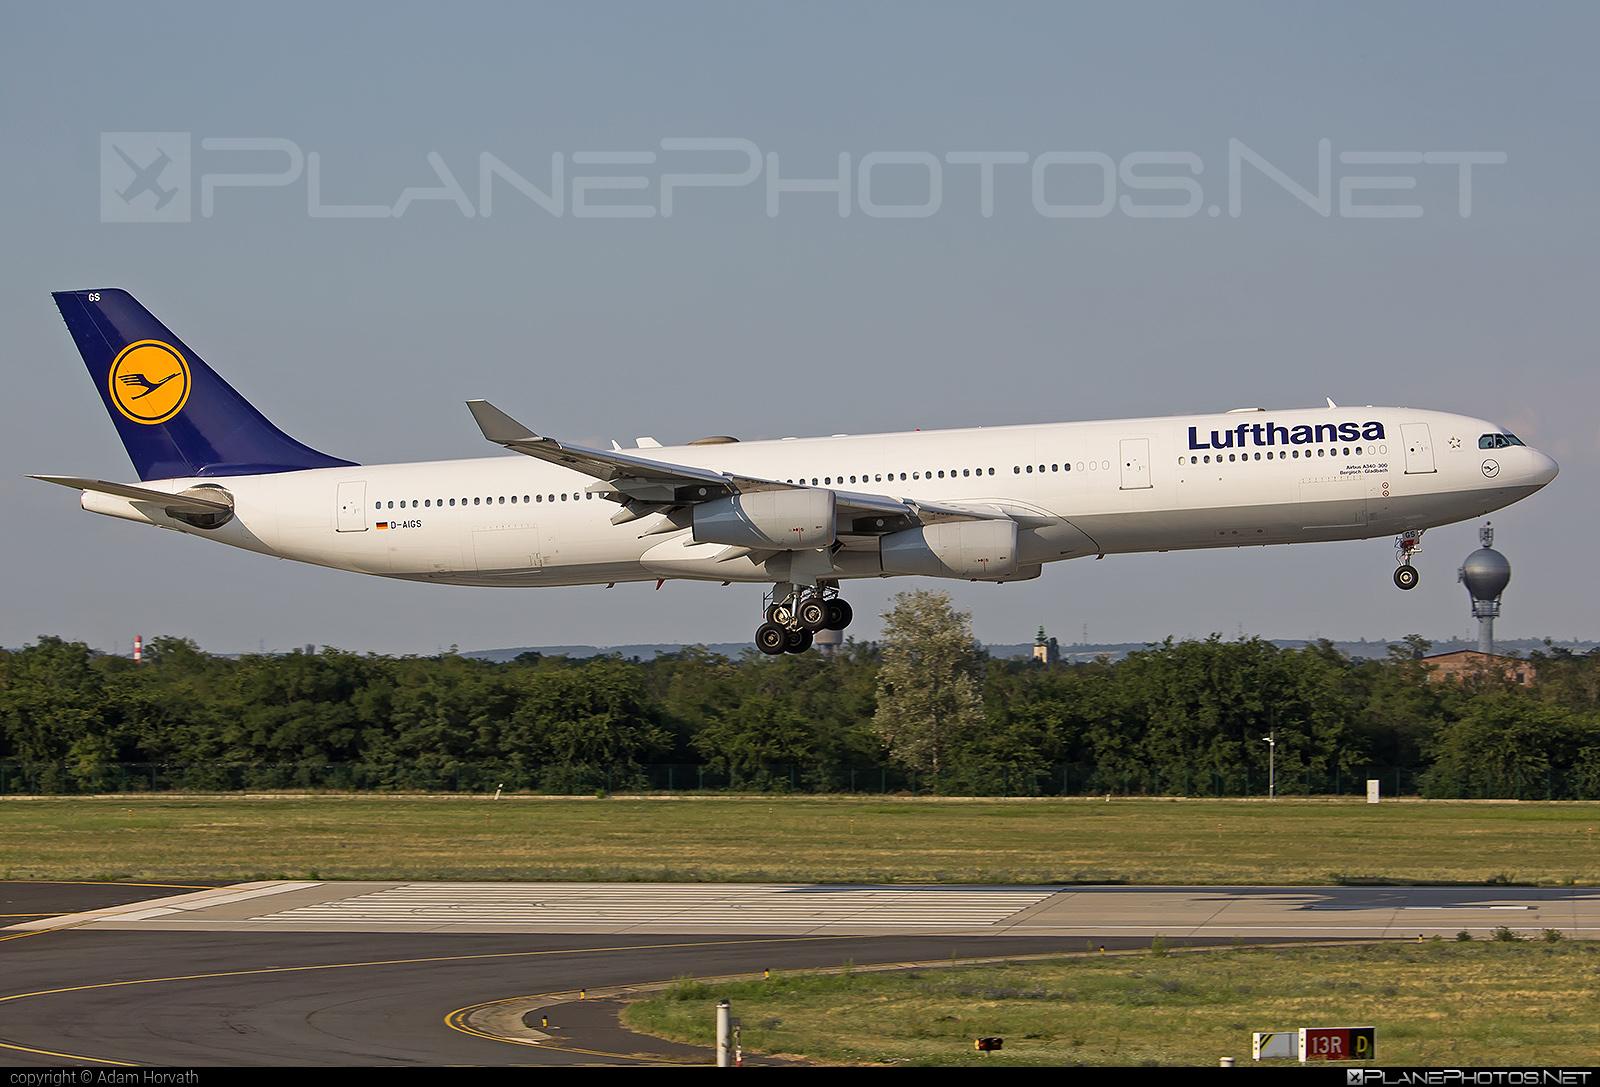 Airbus A340-313 - D-AIGS operated by Lufthansa #a340 #a340family #airbus #airbus340 #lufthansa